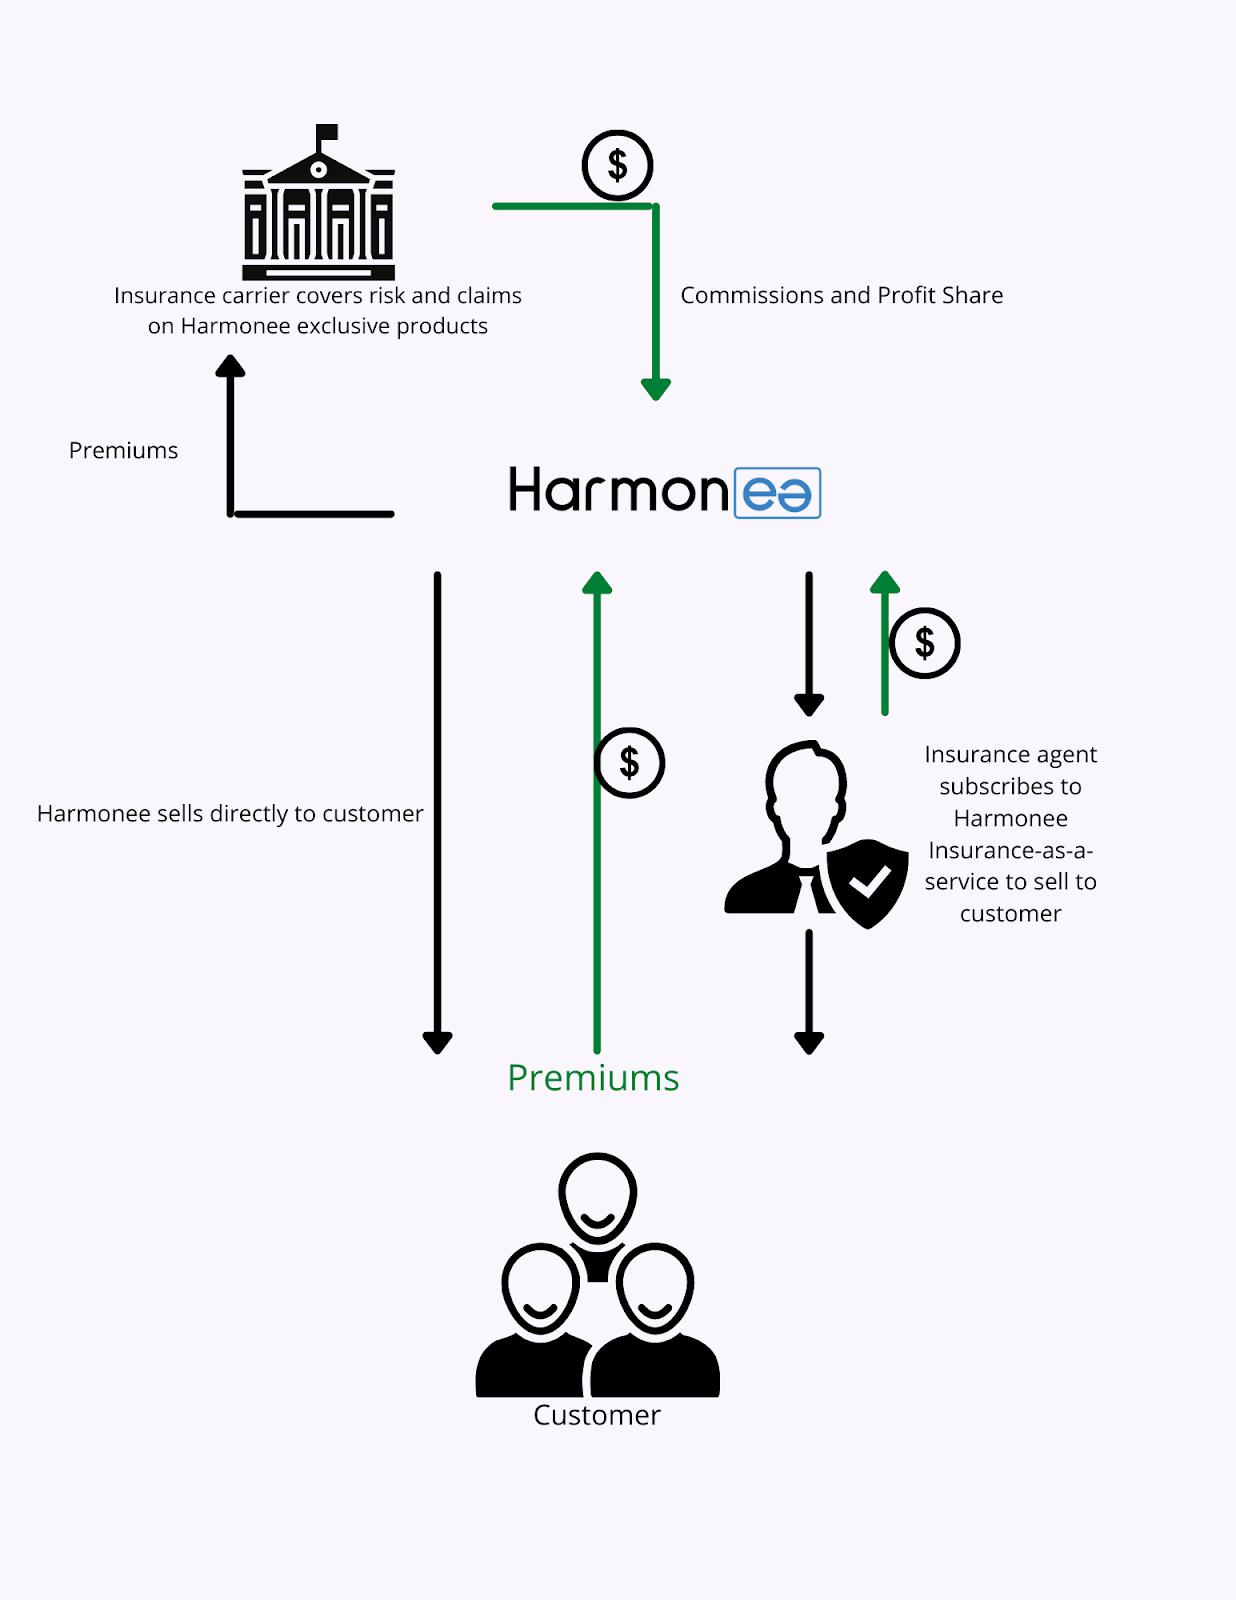 Harmonee's business model flow-chart